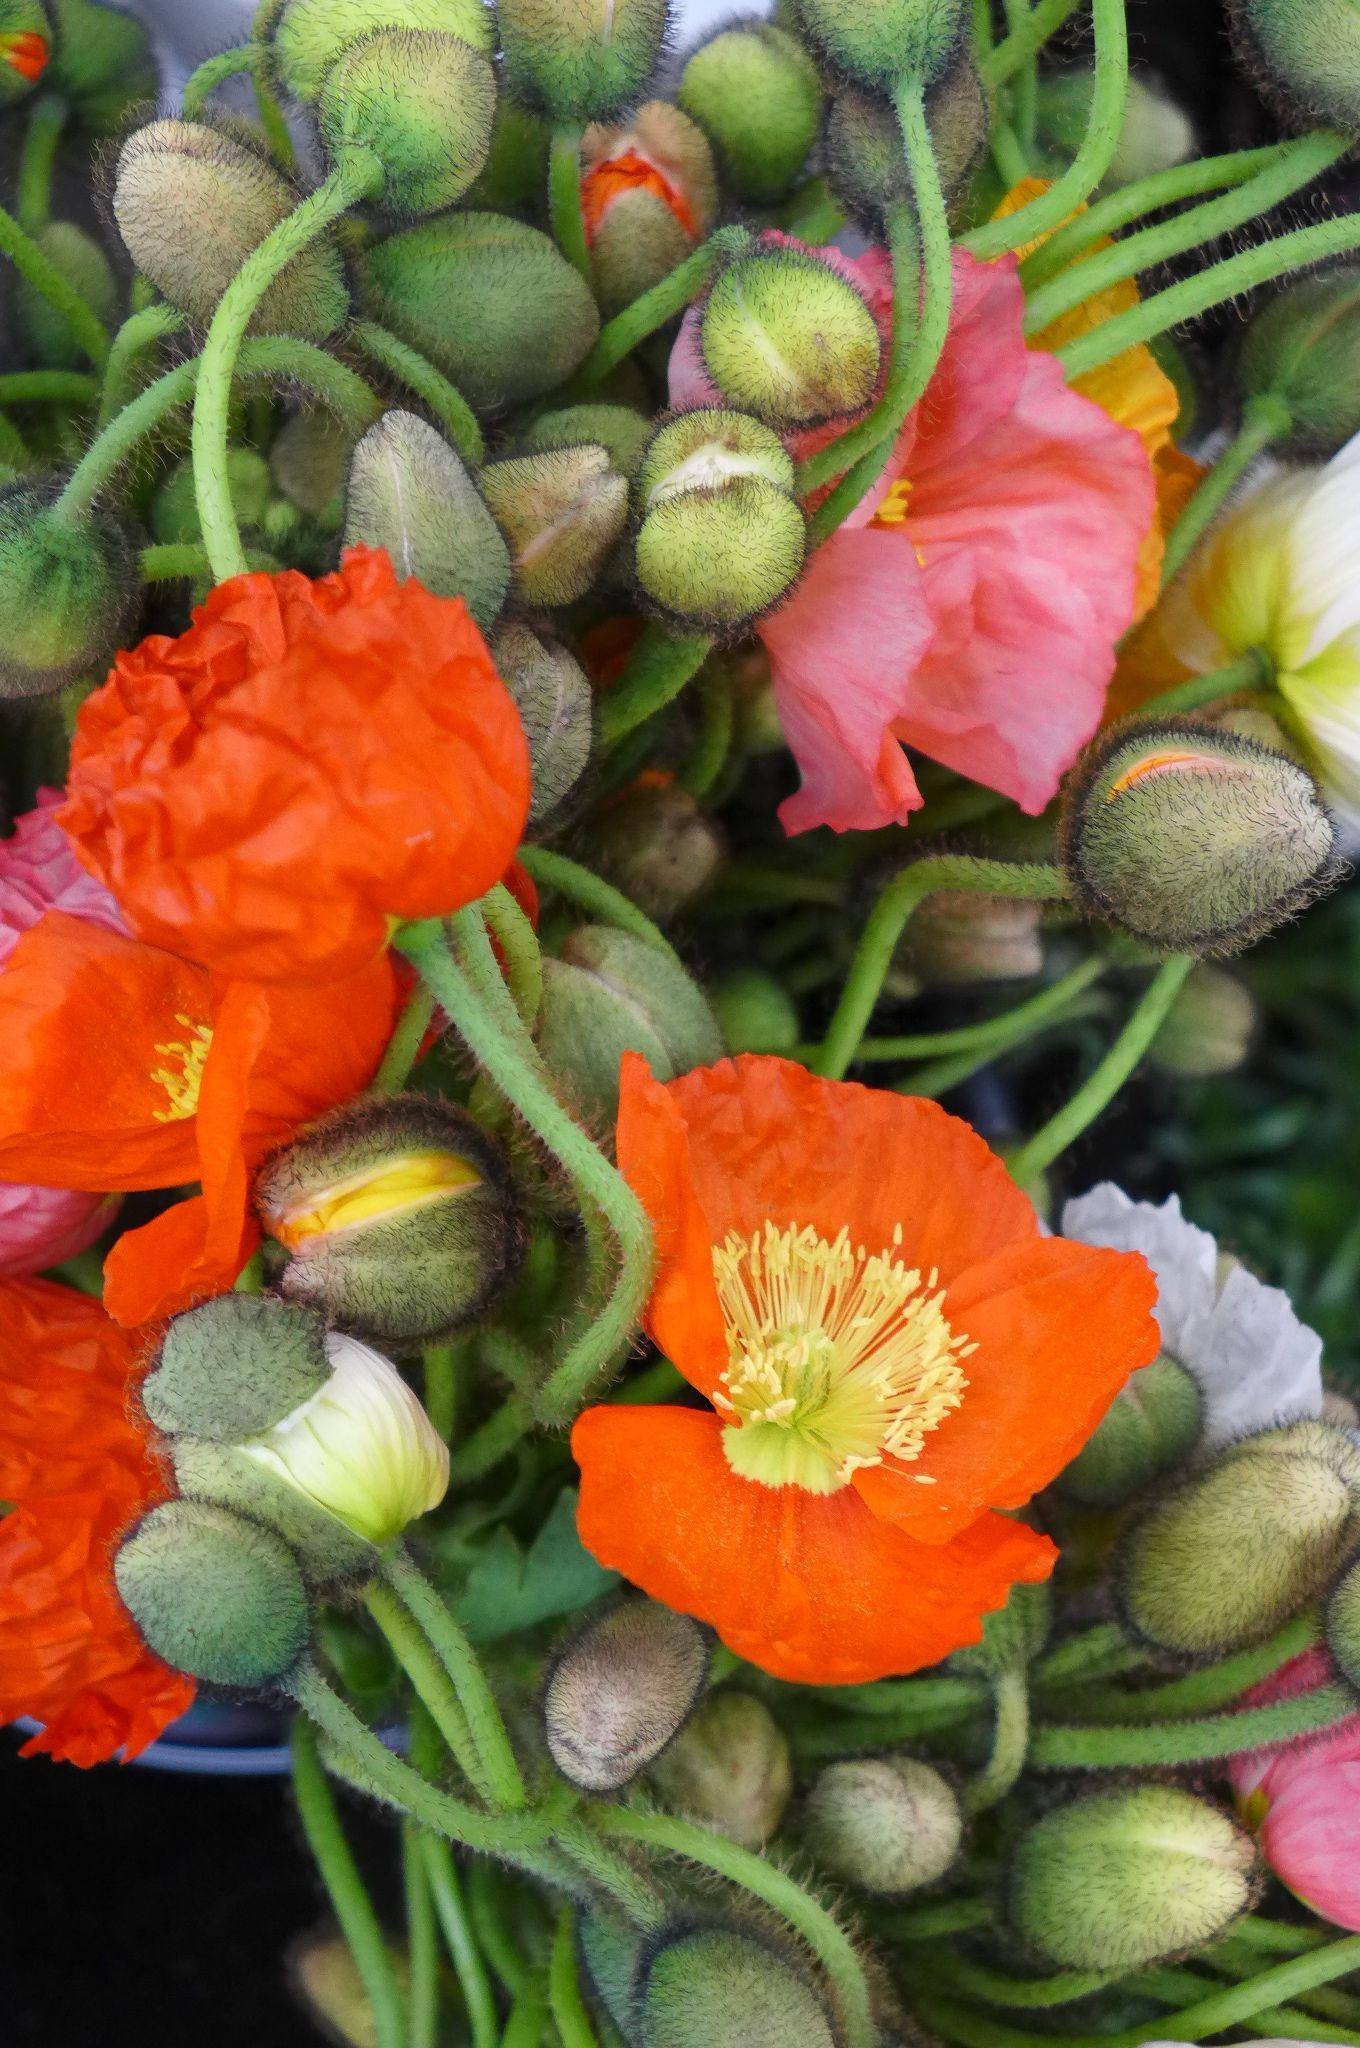 LA Flower Market - Chris Dangtran